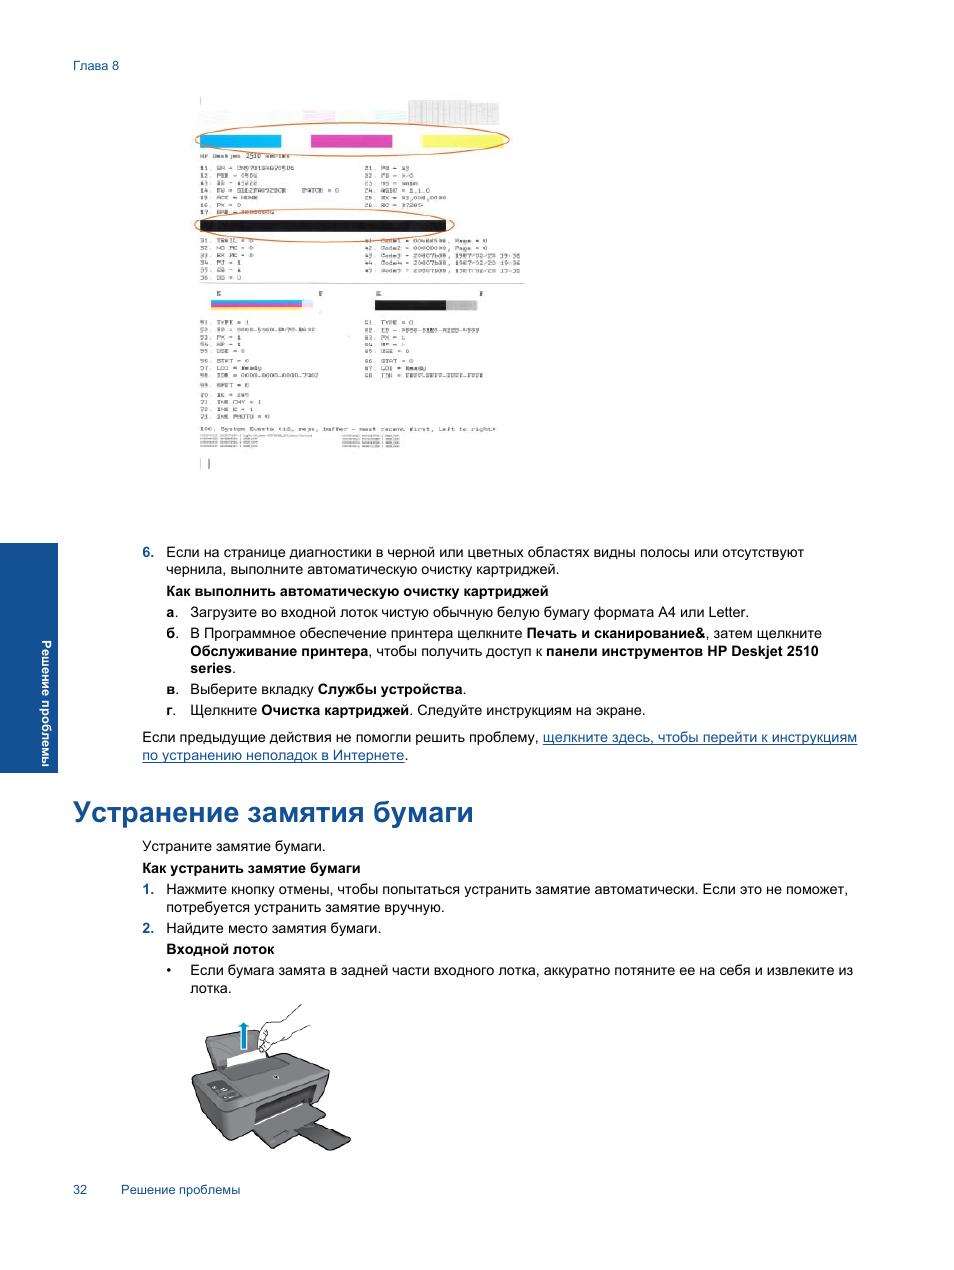 Устранение замятия бумаги Инструкция по эксплуатации HP Deskjet Ink Advantage 2515 Страница 34 / 54 Оригинал